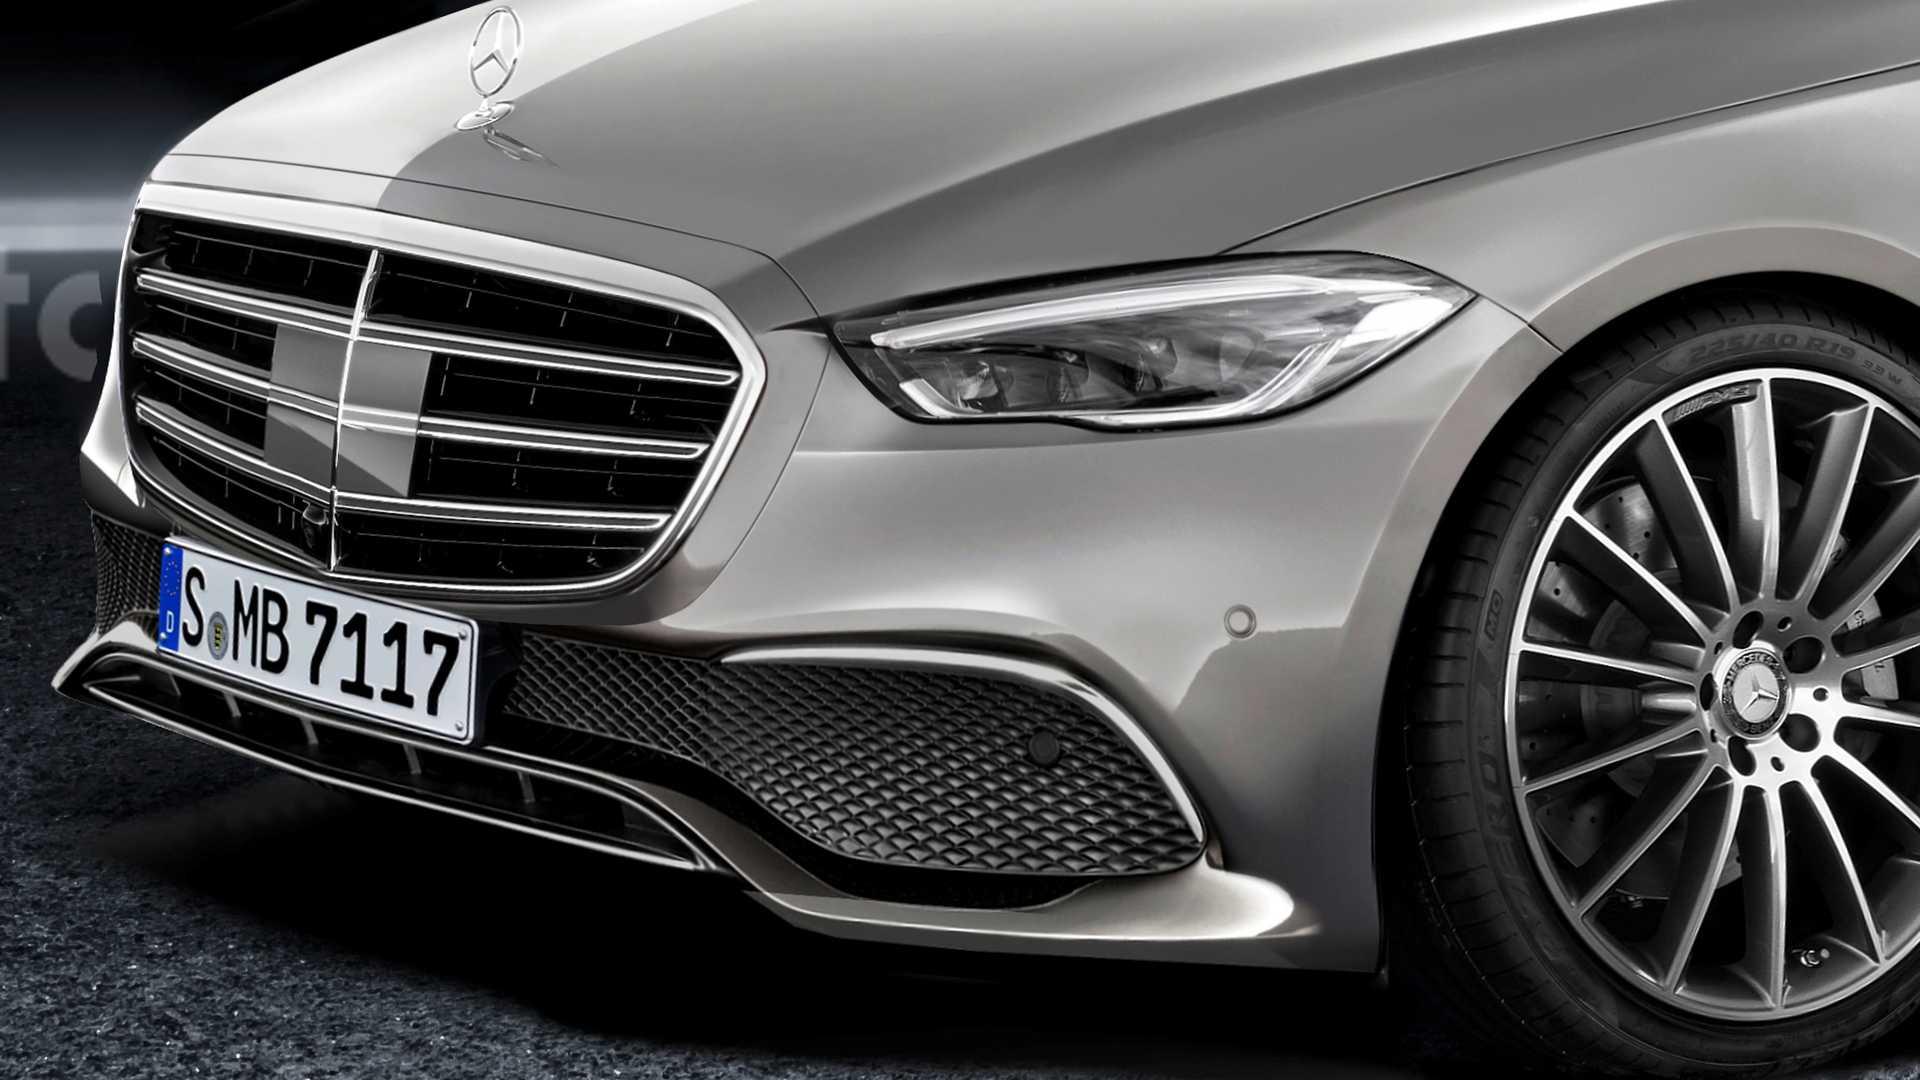 Mercedes Classe S 2021 render